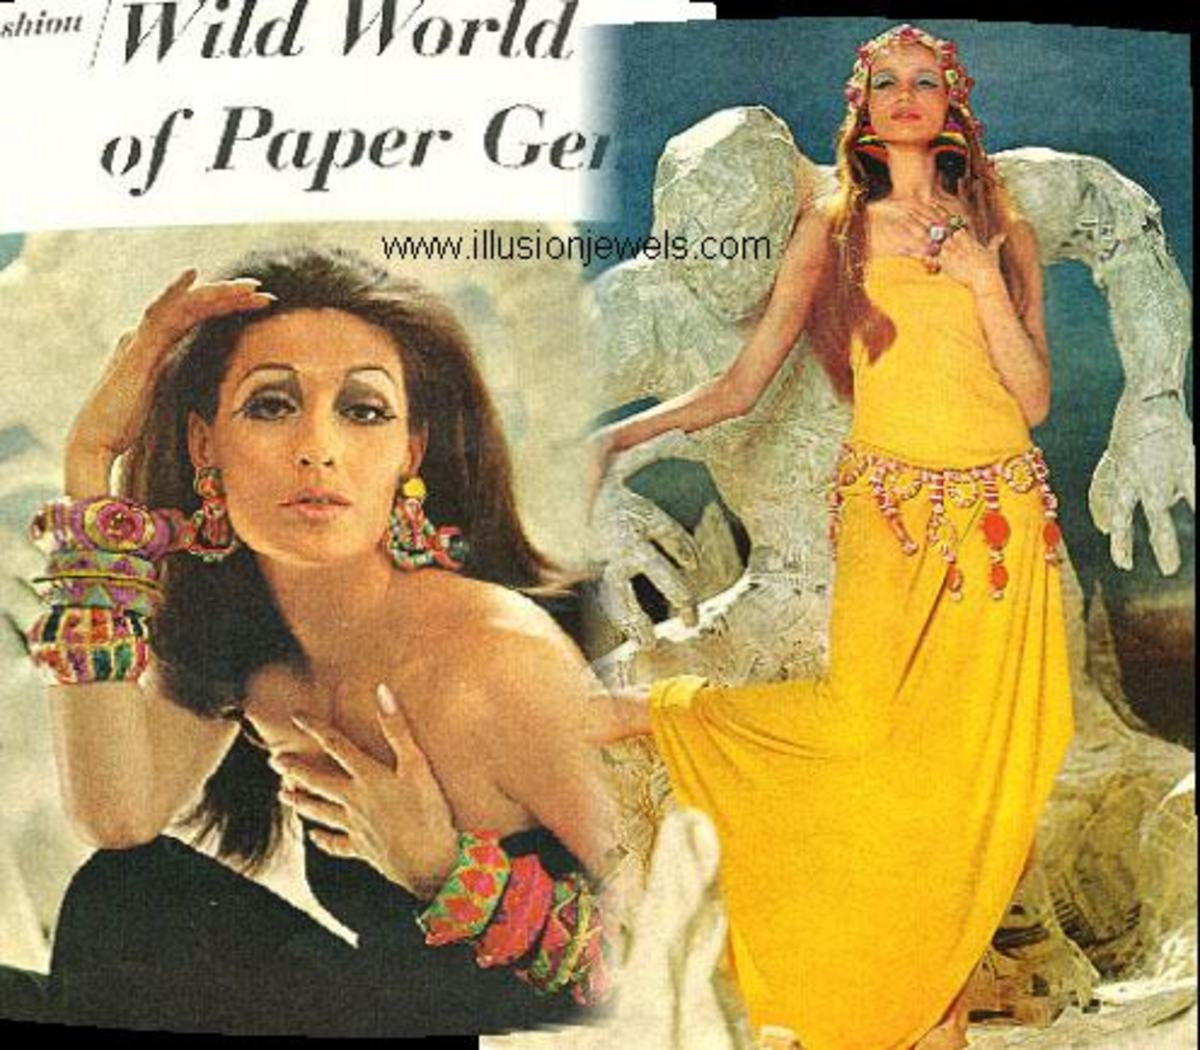 Papier-mache Jewelry from 1966